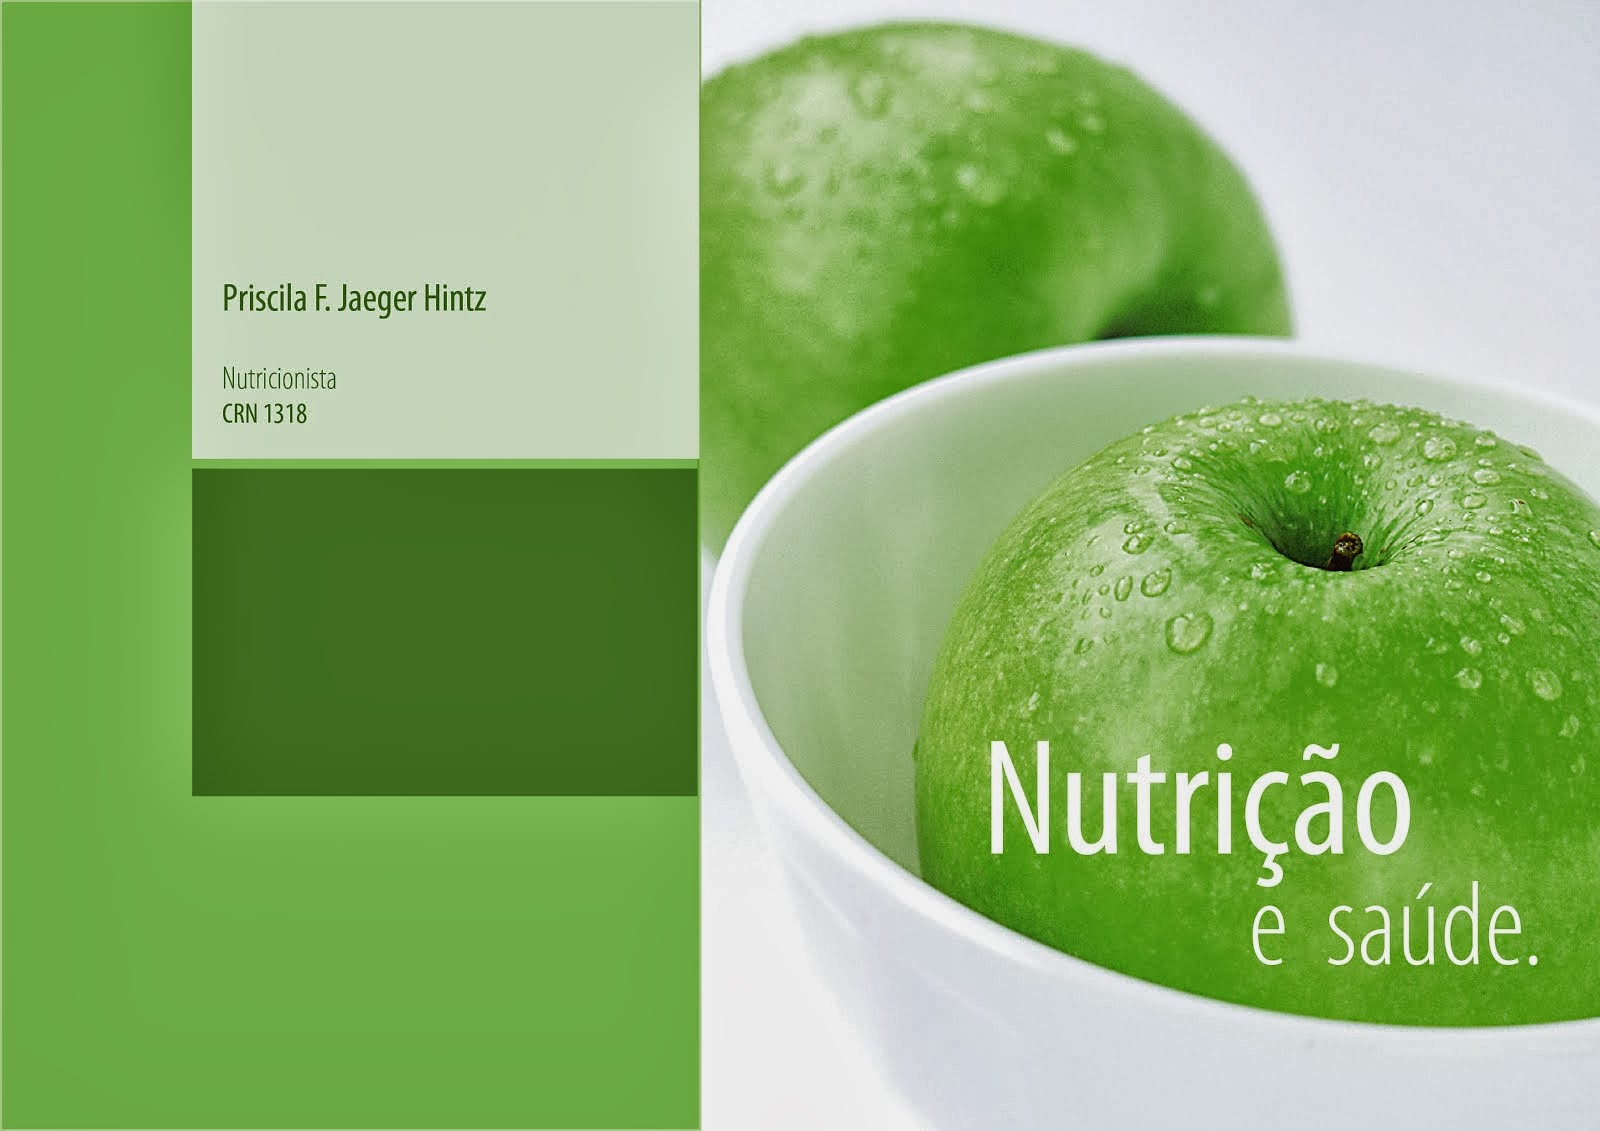 Nutricionista Priscila F. J. Hintz